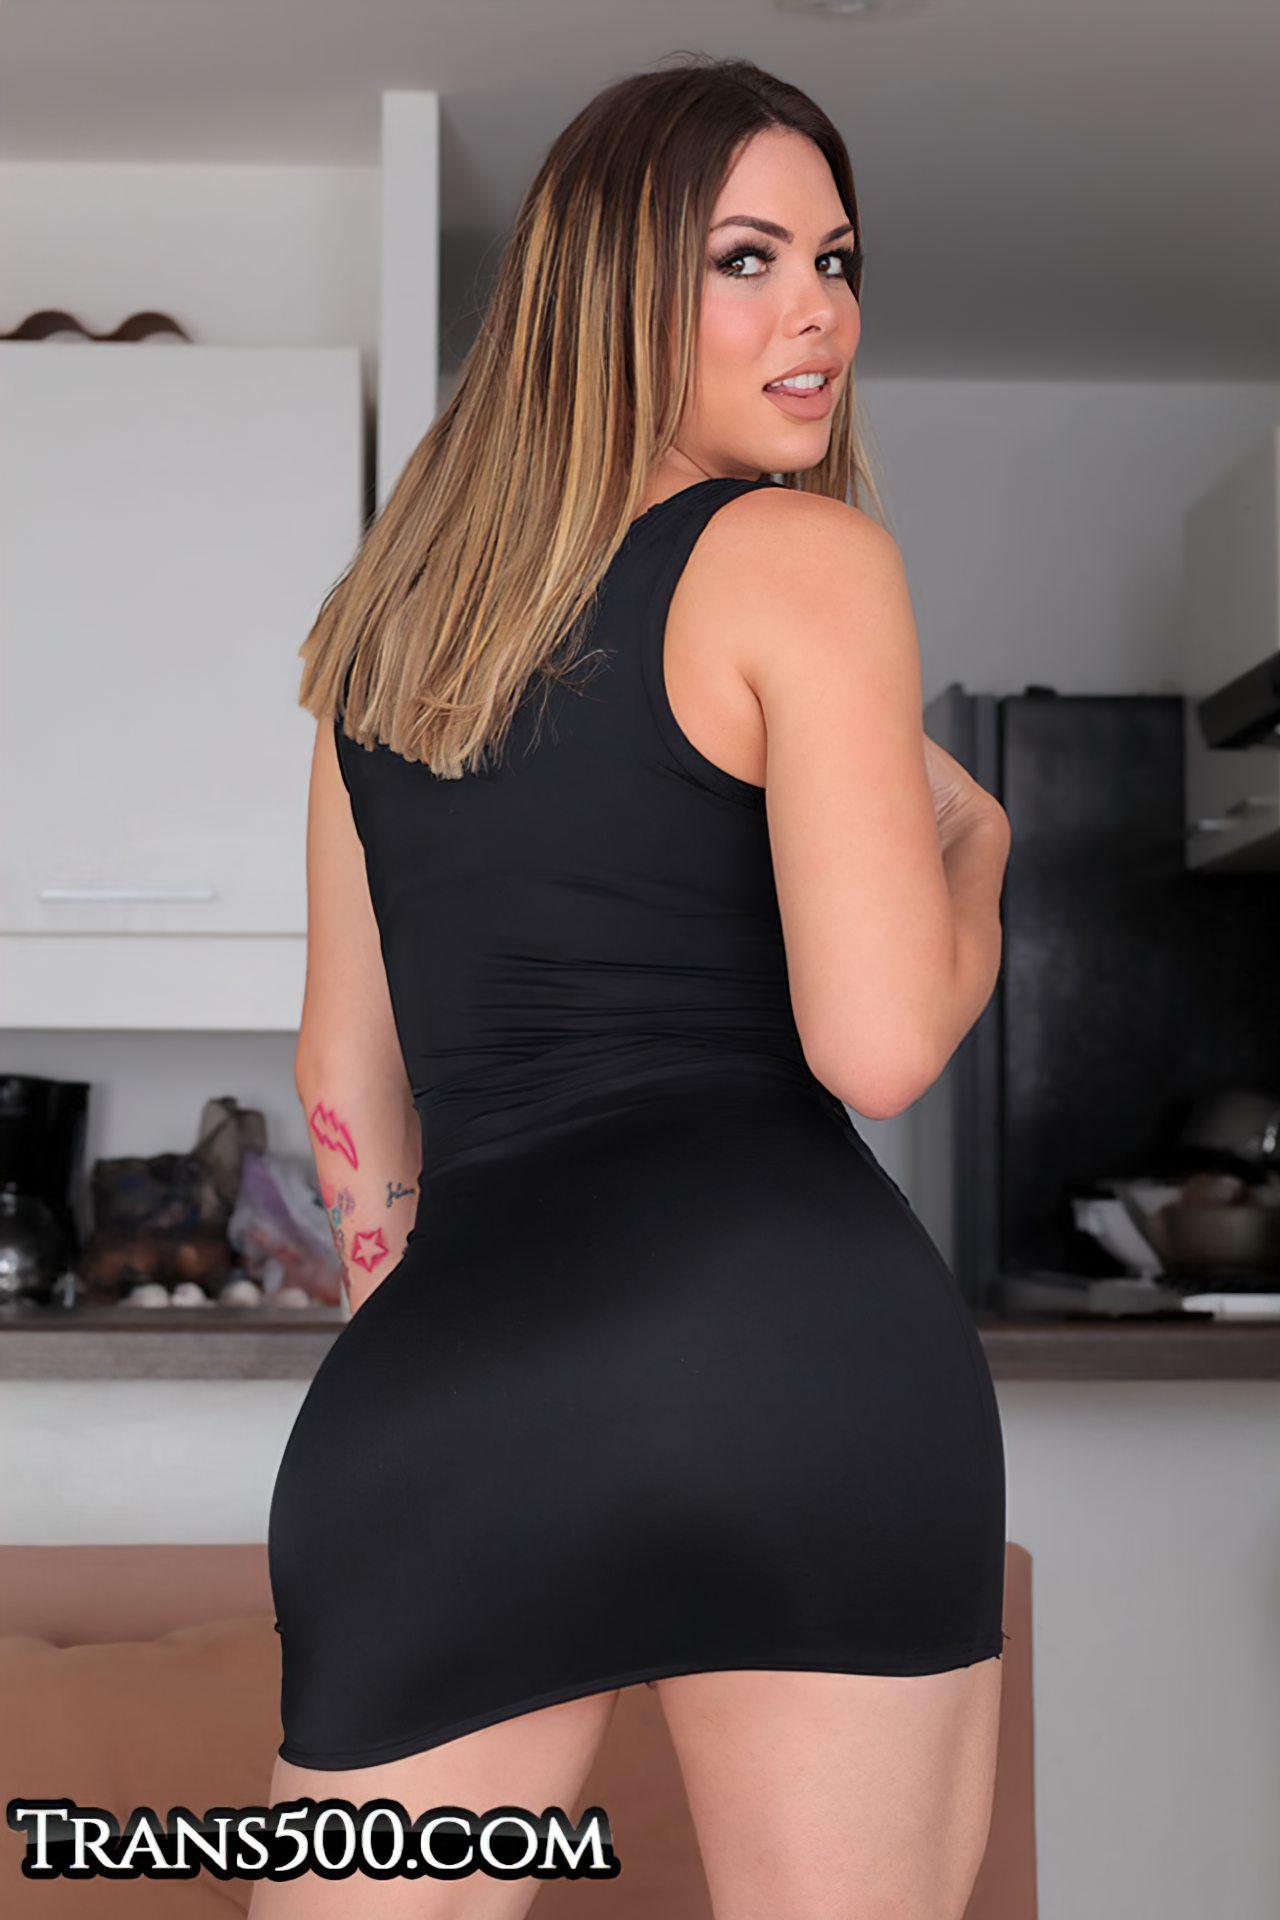 Gia Itzel Star Pagando Boquete (2)